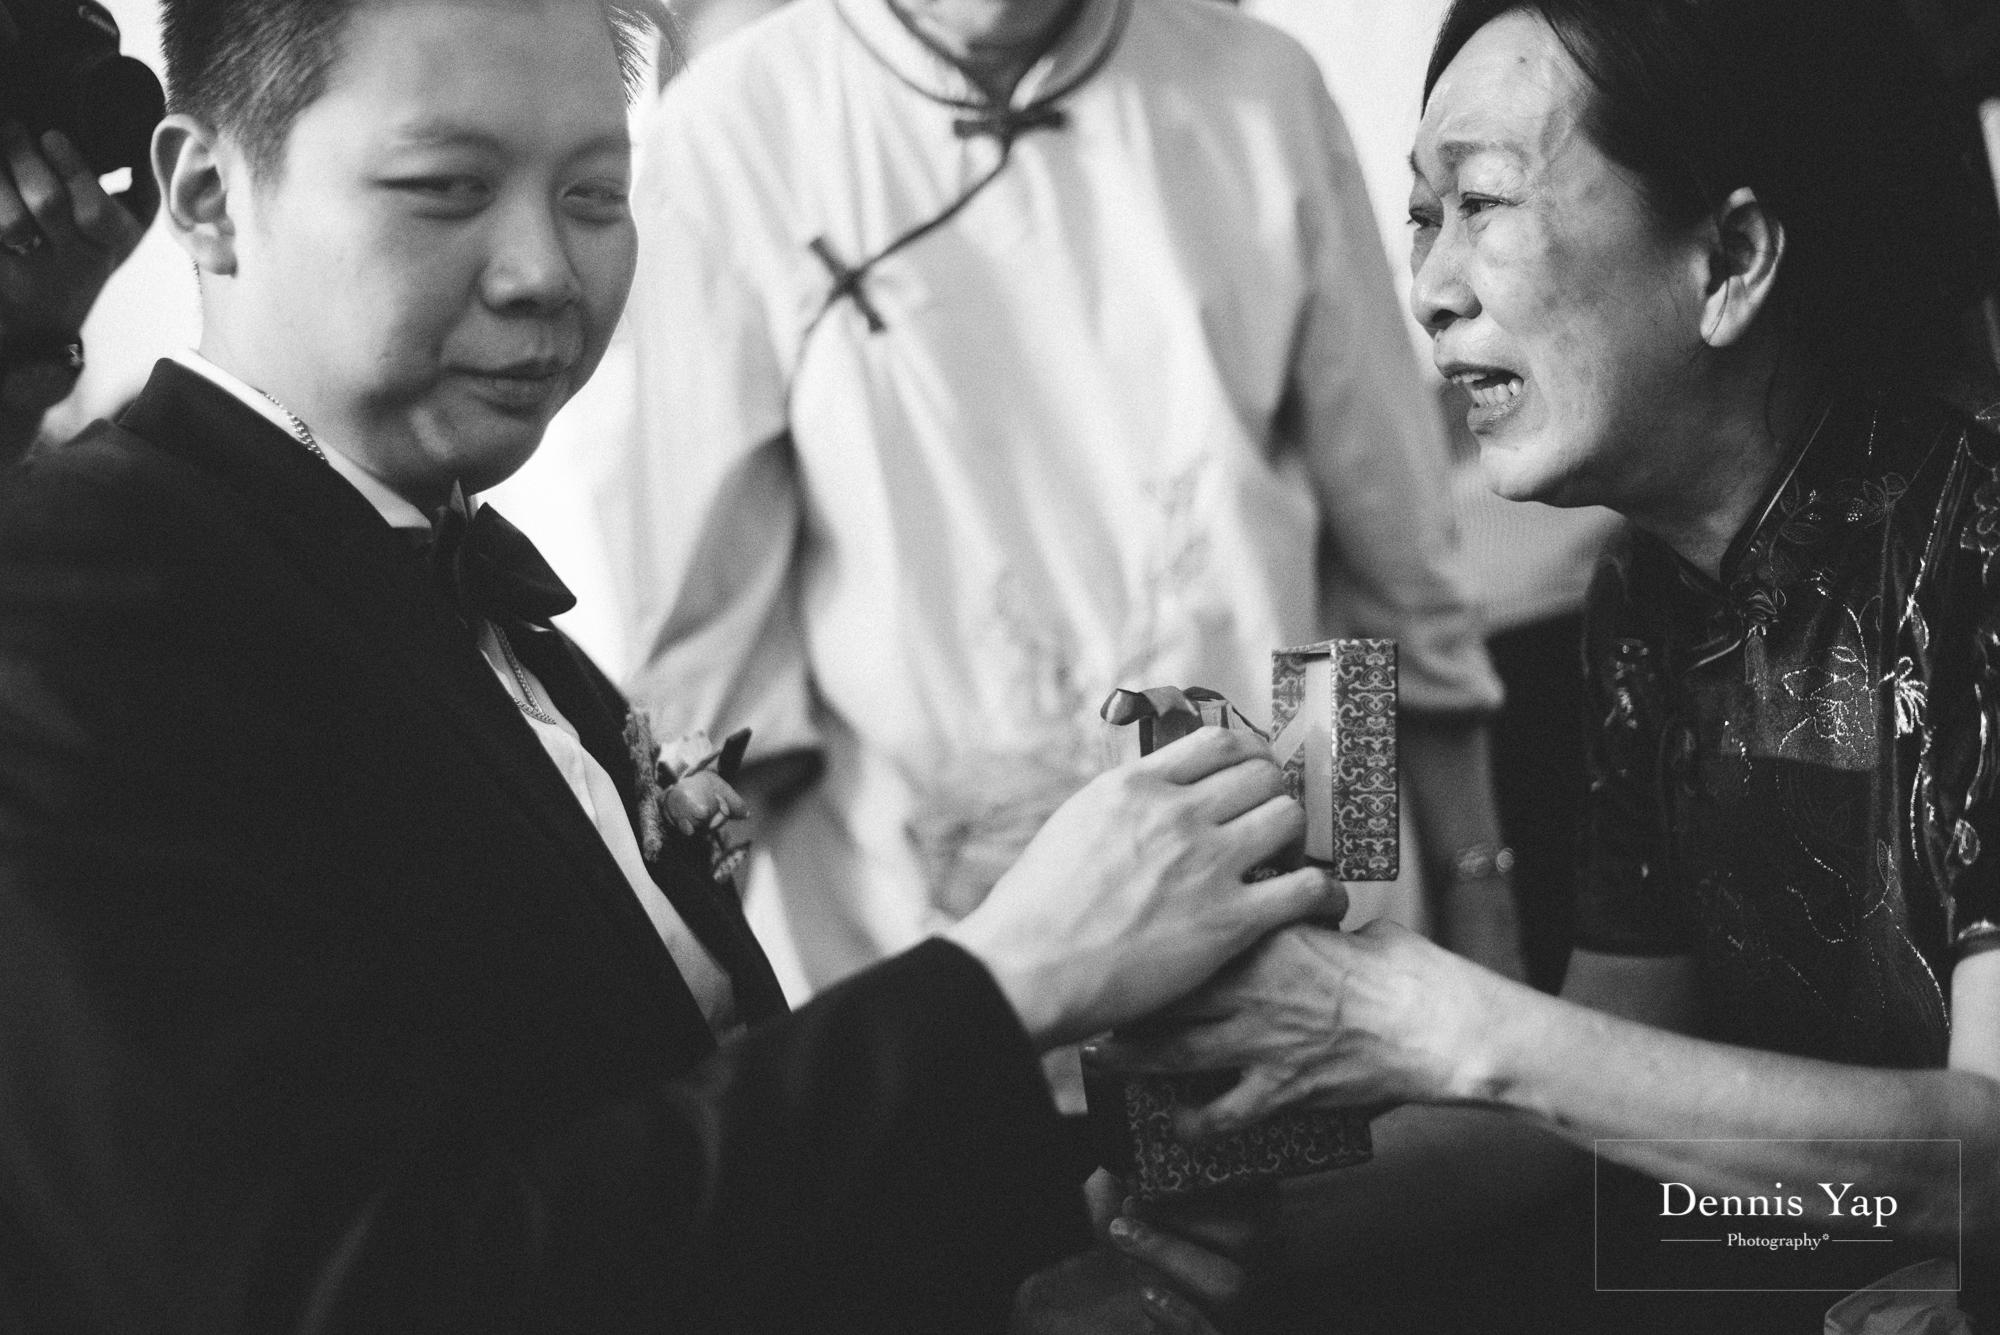 ino sheri black white church wedding st thomas more subang jaya dennis yap photography touching love beloved australia indonesia-13.jpg